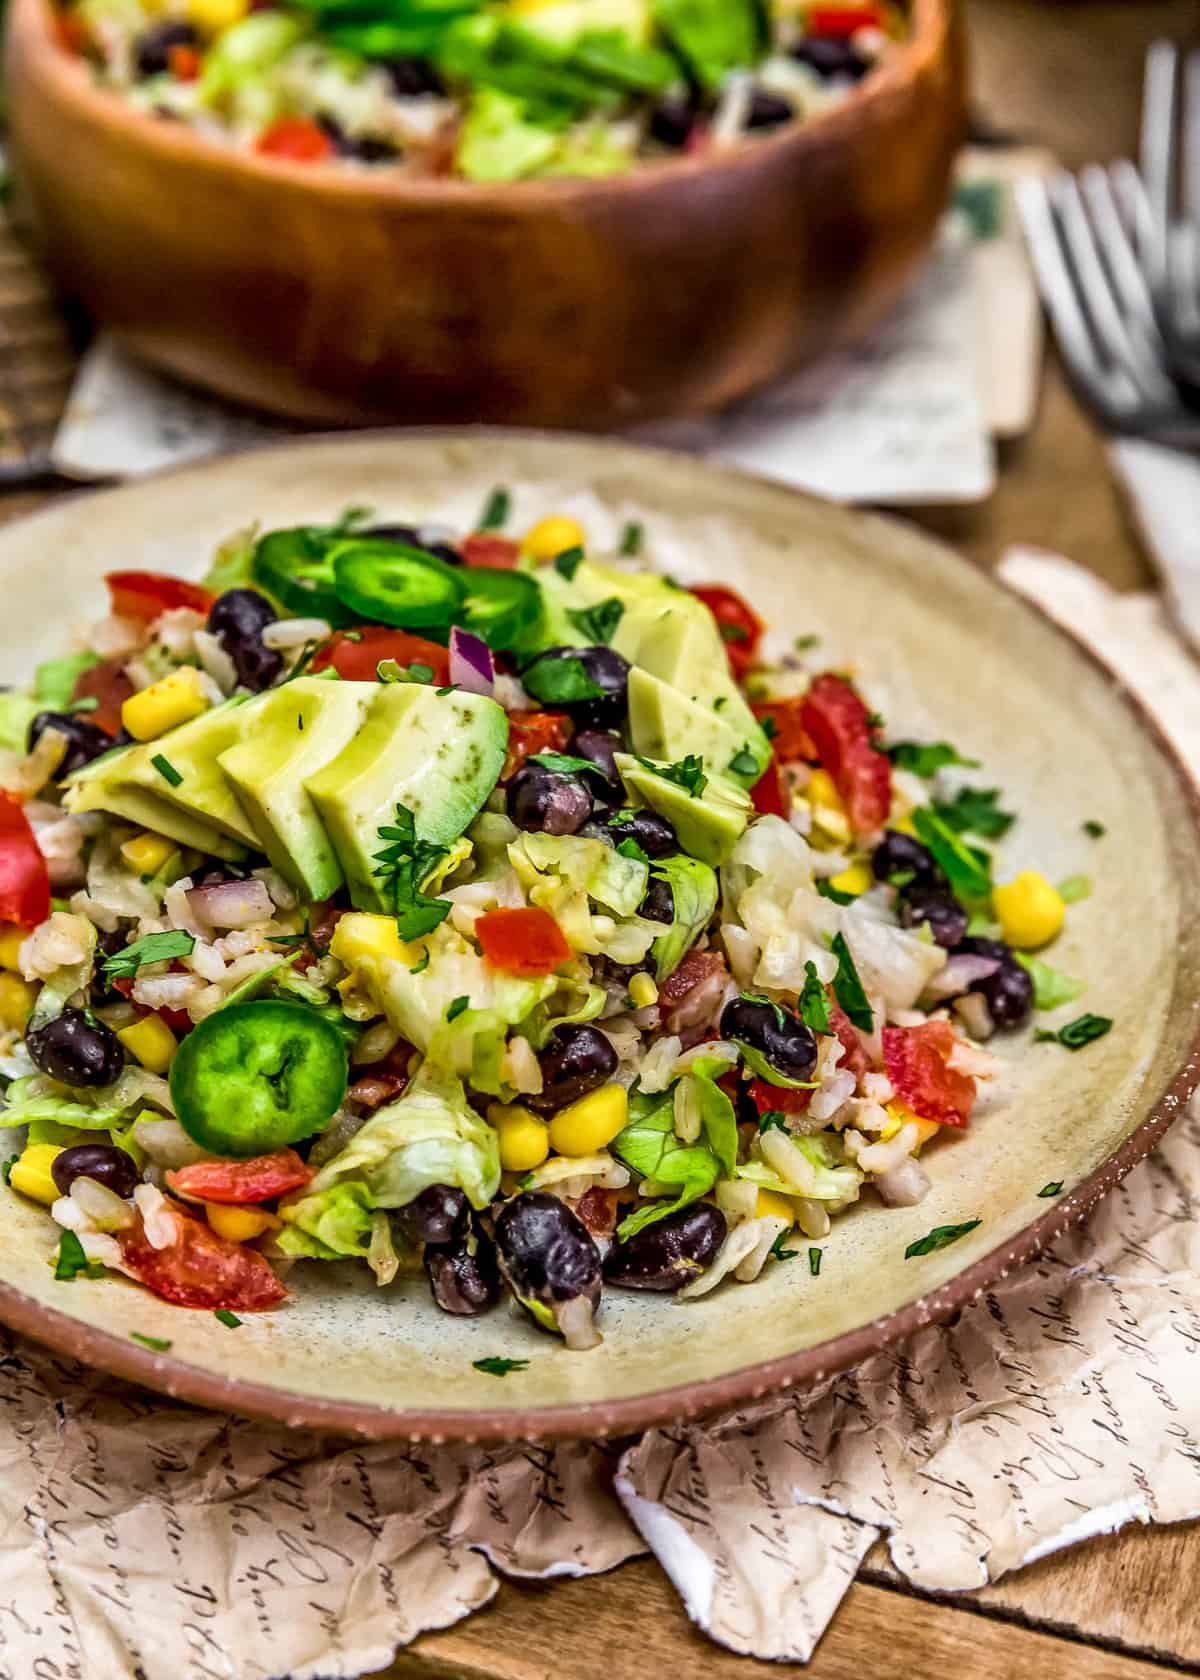 Plated Tex-Mex Rice Salad